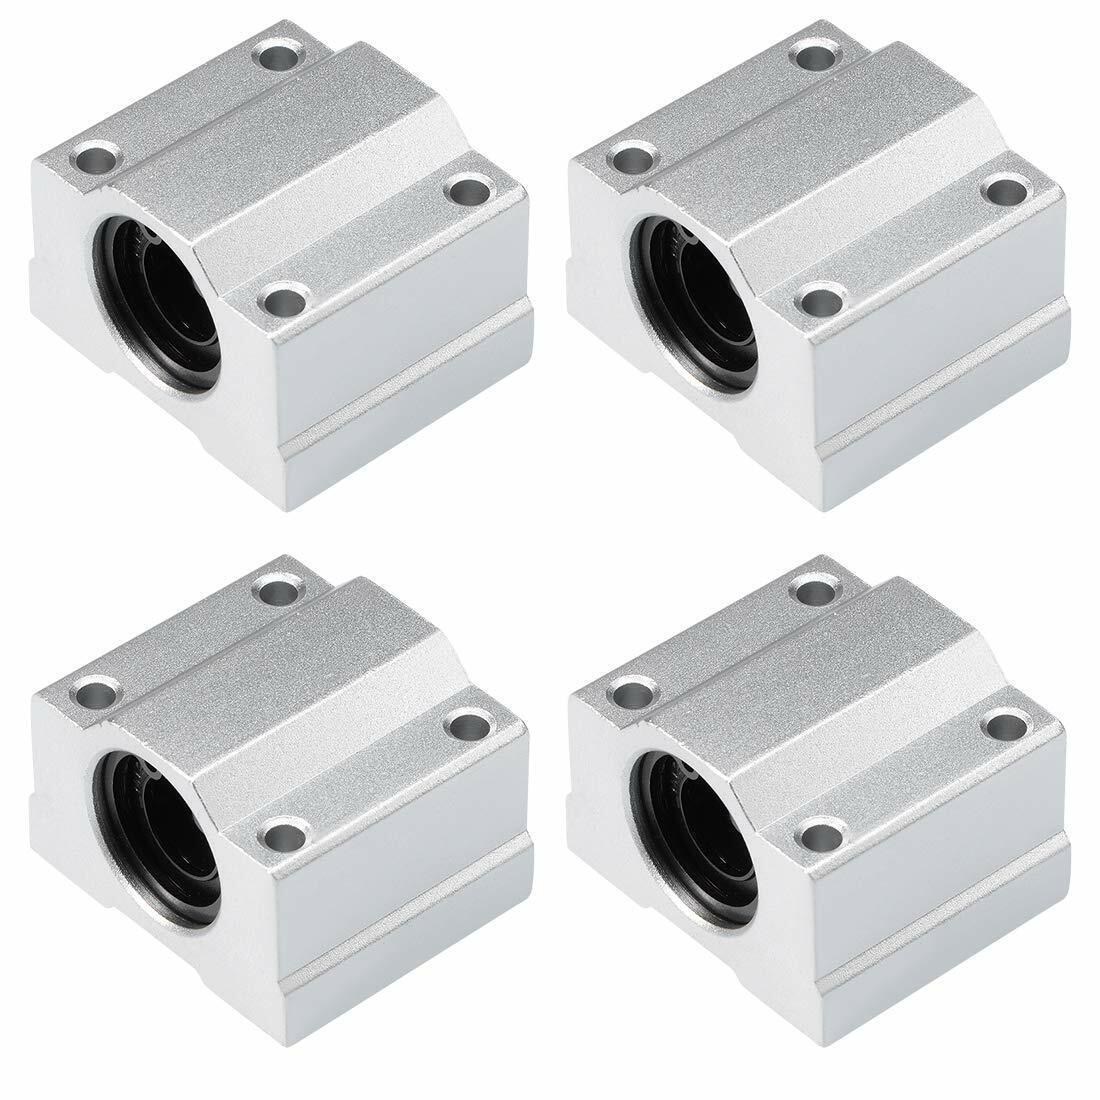 4X SC8UU SCS8UU 8mm Linear Ball Bearing Linear Motion Bearing Slide For CNC M22